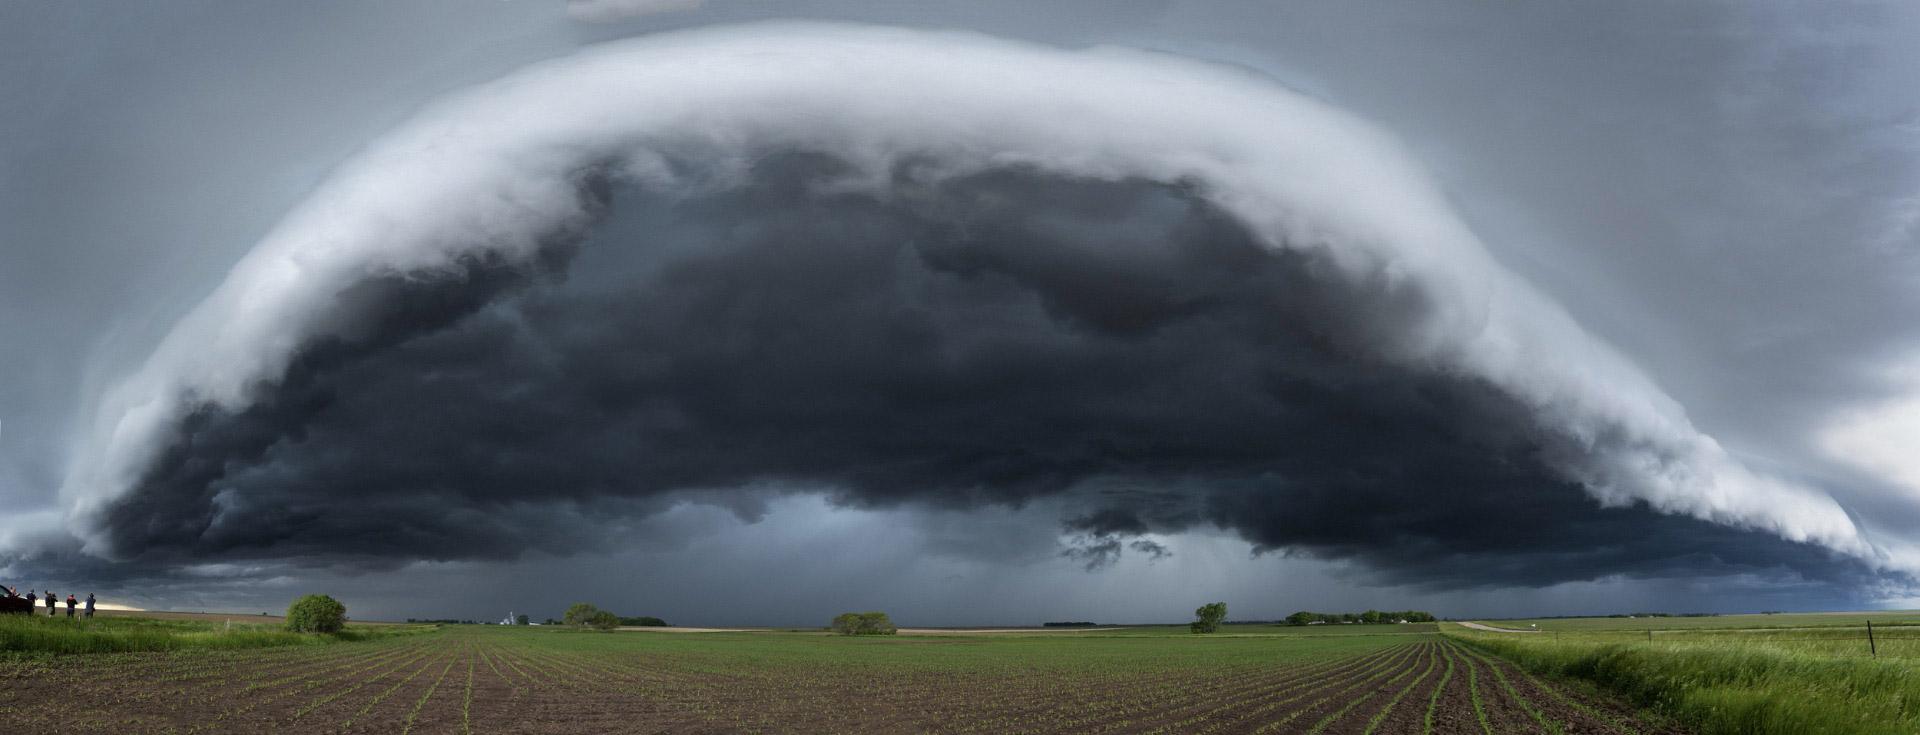 Джон Финней / John Finney, Фотоконкурс RMetS / RPS Weather